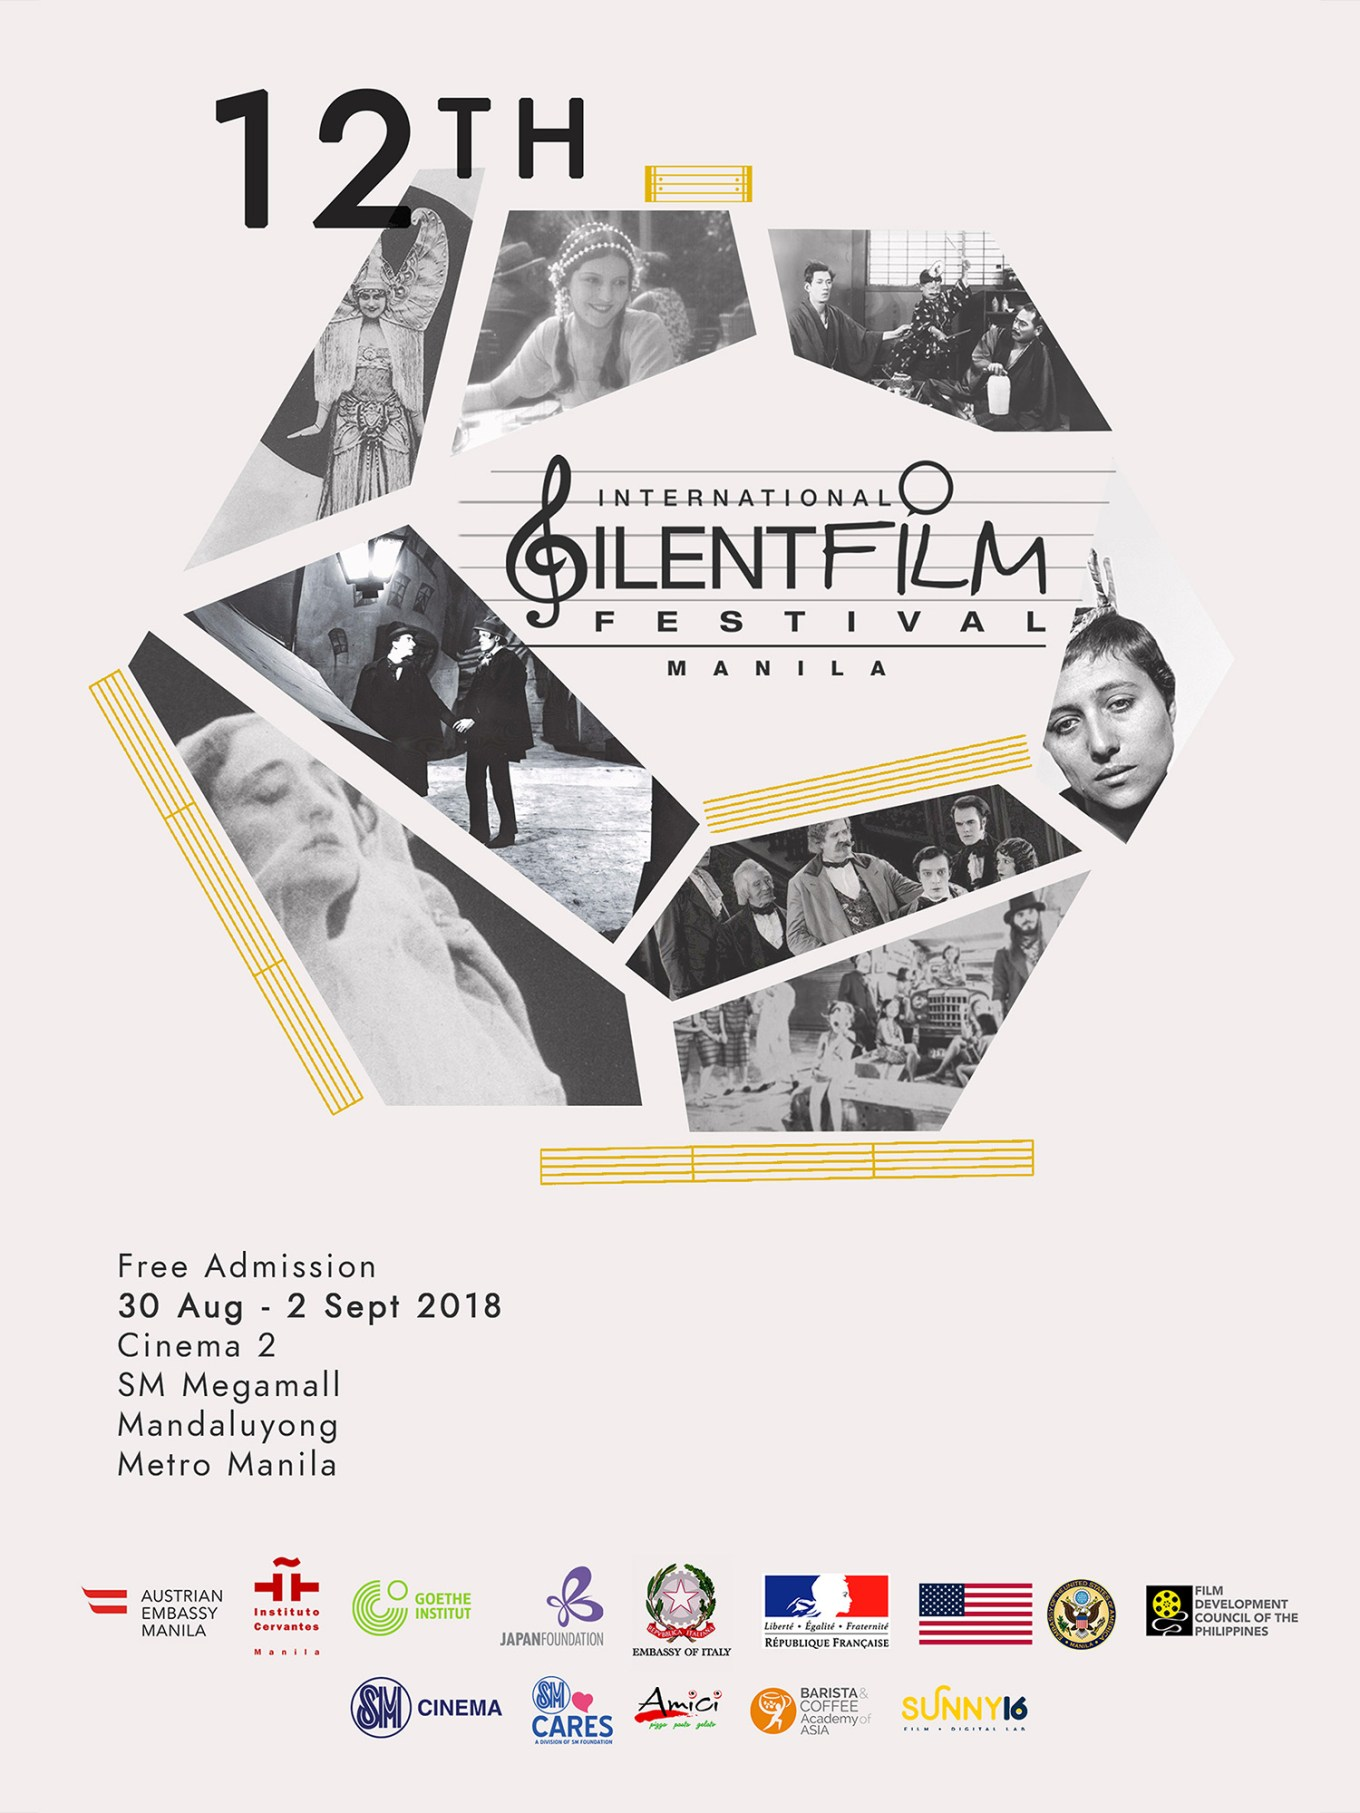 ISFF '18 - Silent Film Festival 2018